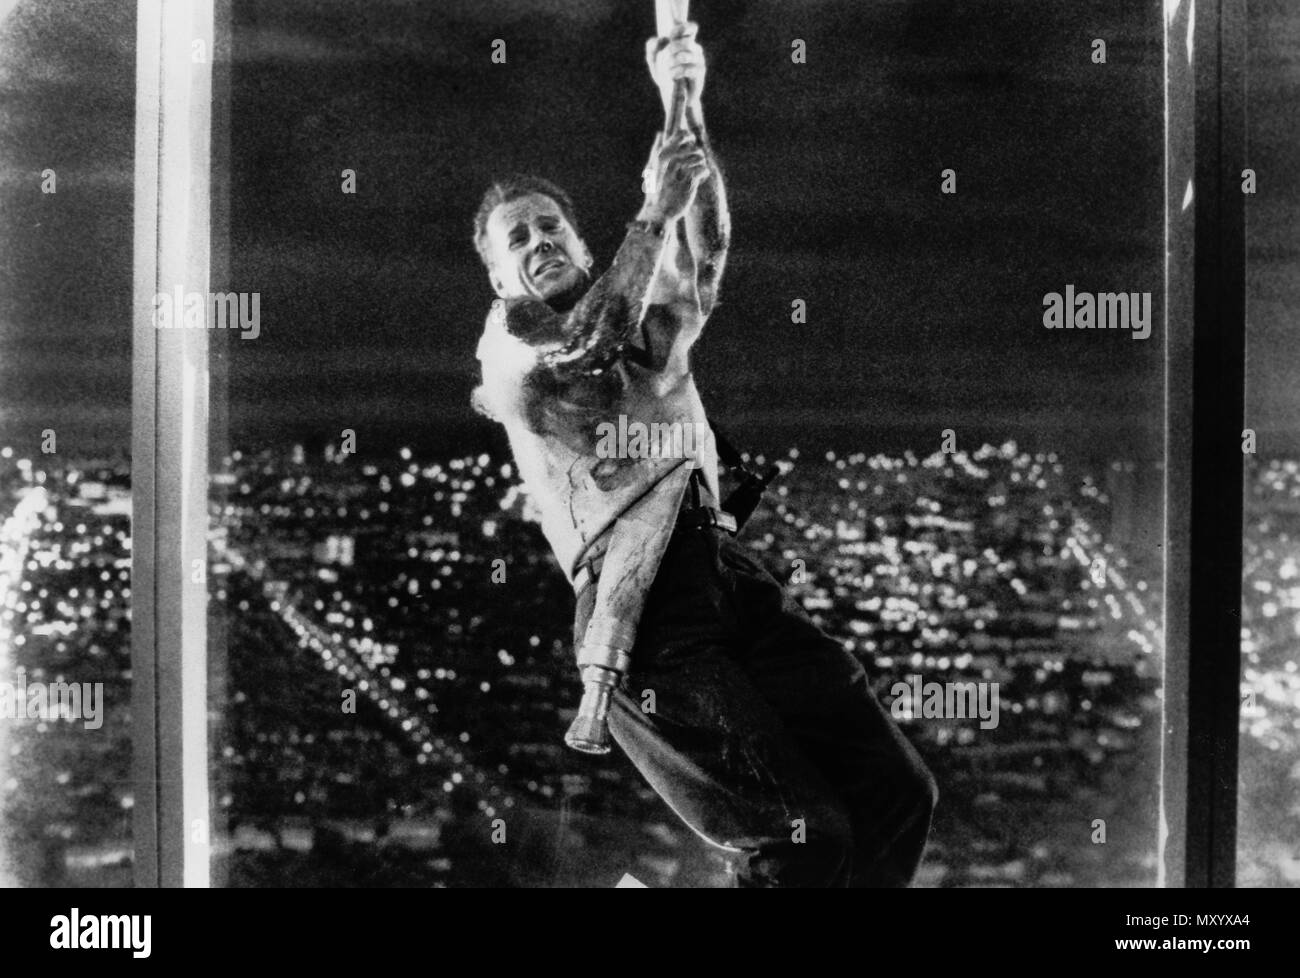 bruce willis, die hard, 1988 - Stock Image